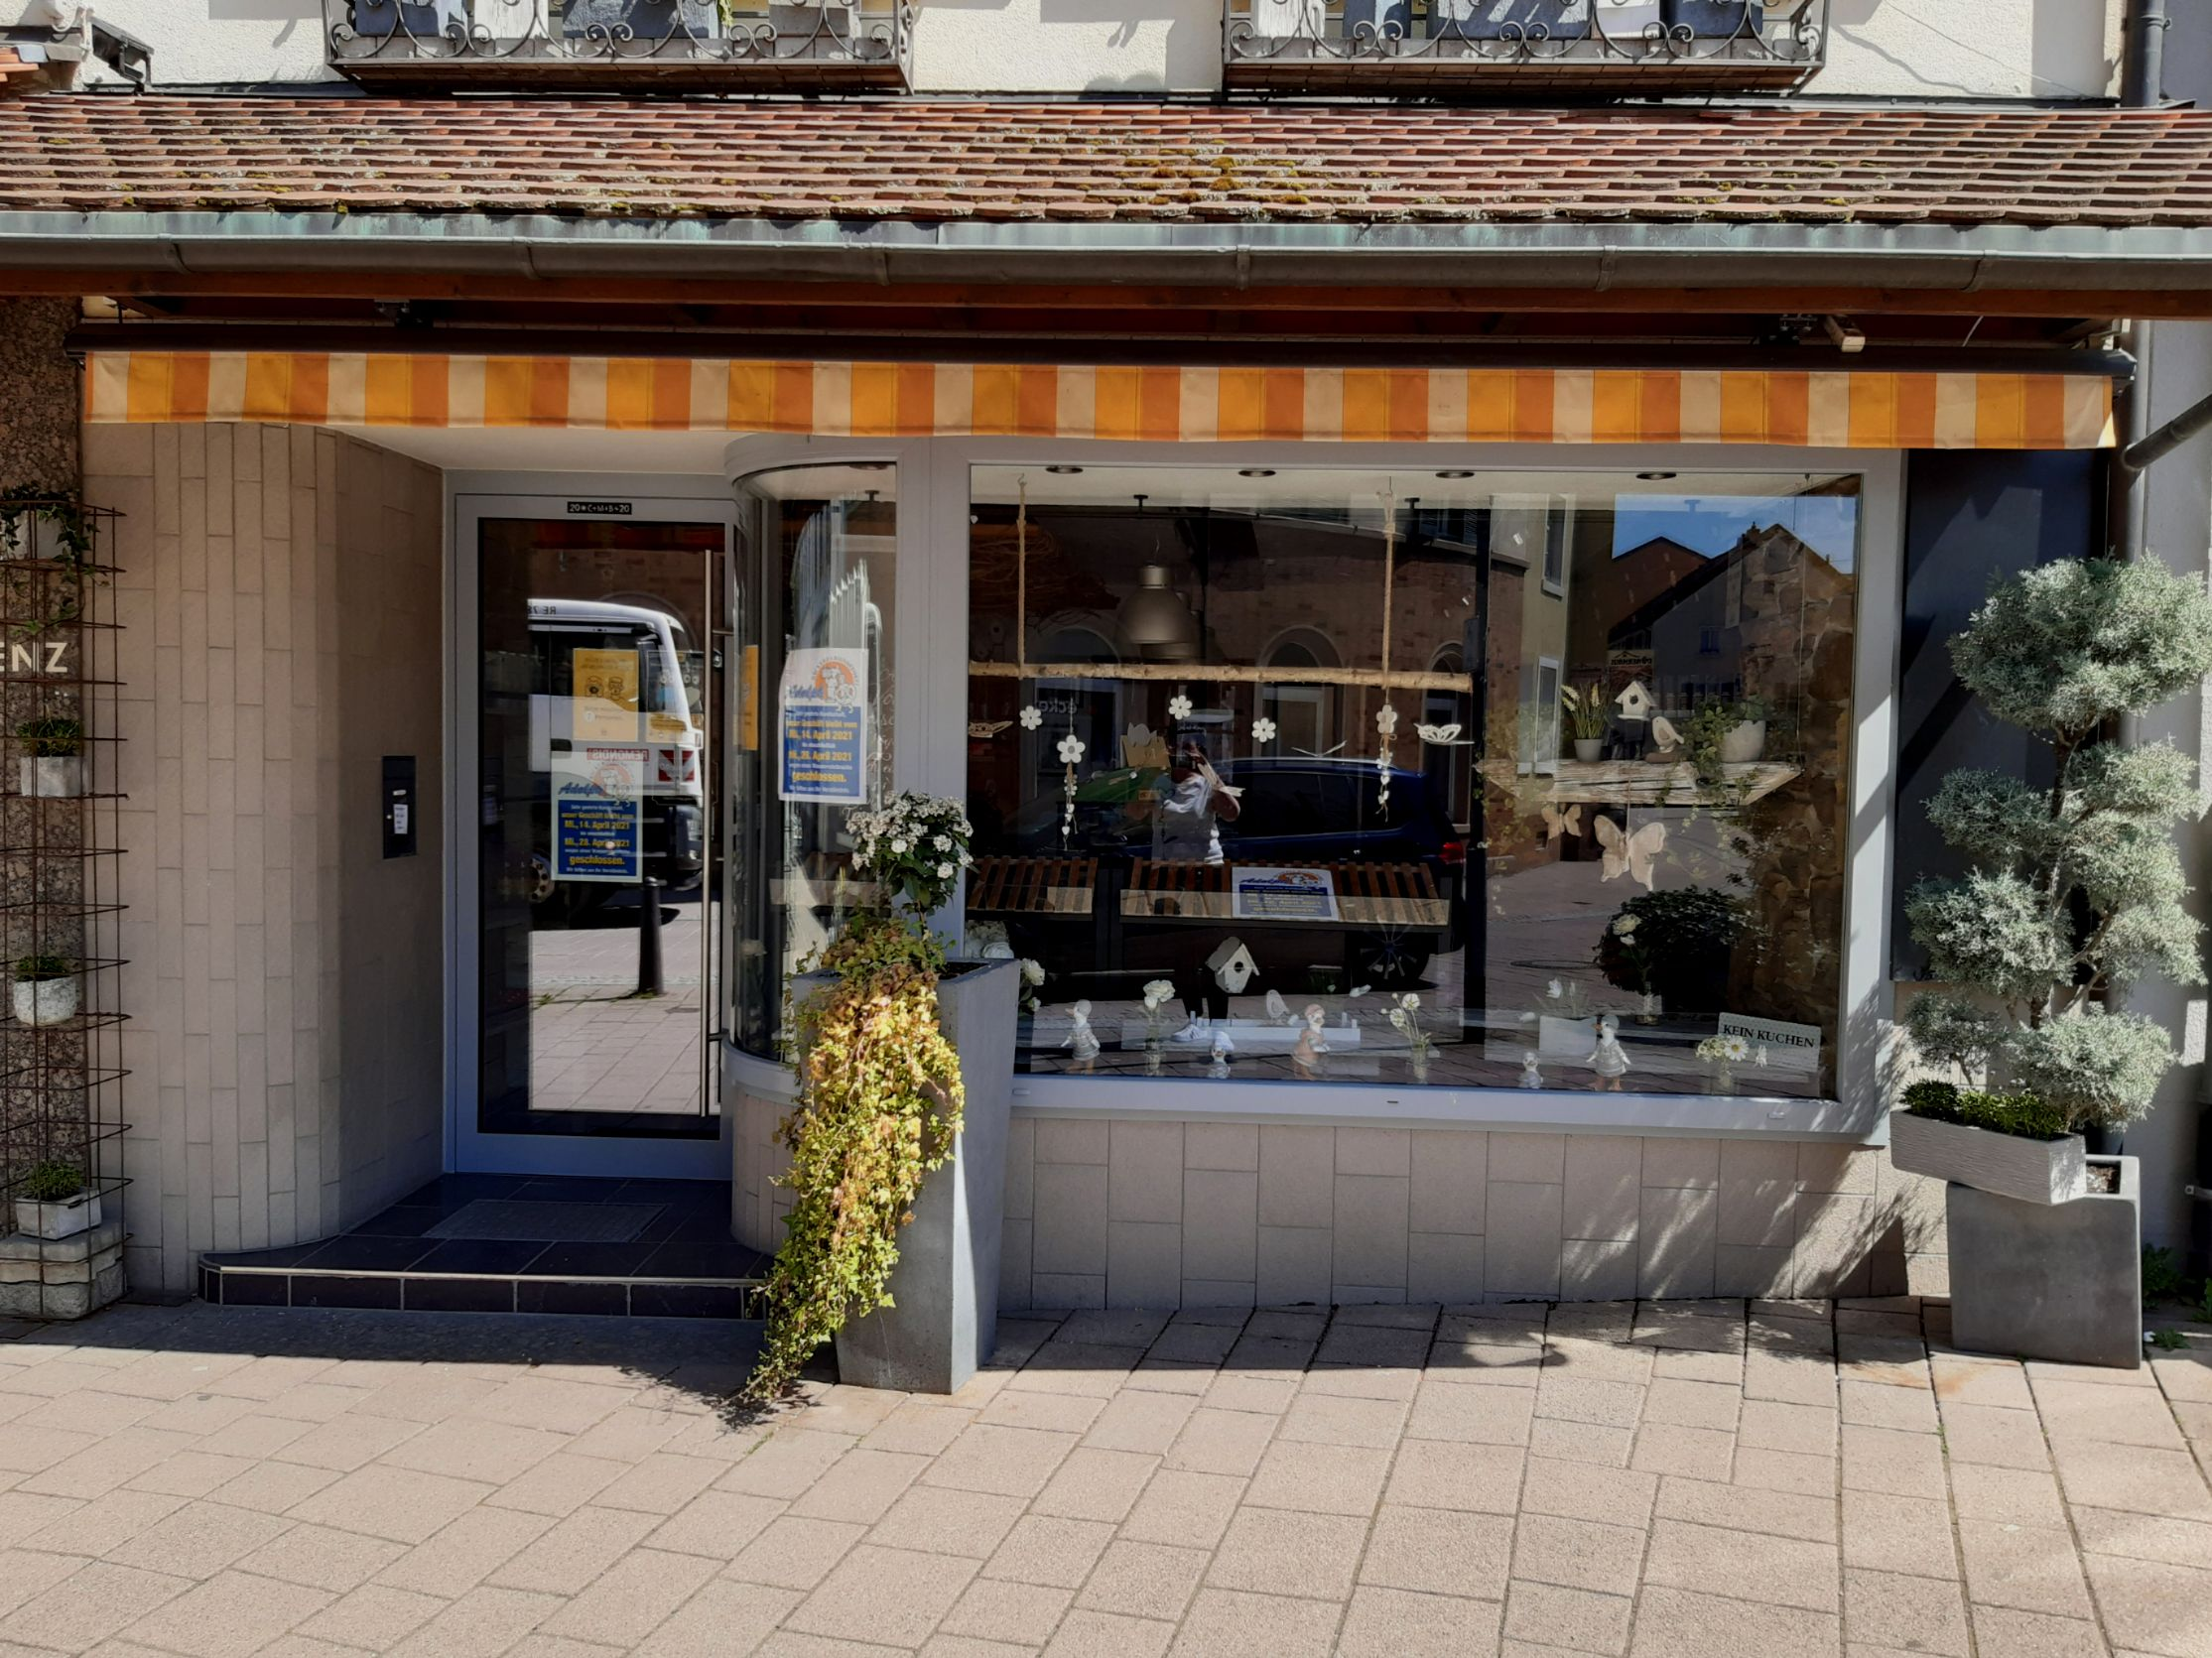 Bäckerei & Konditorei Adolph